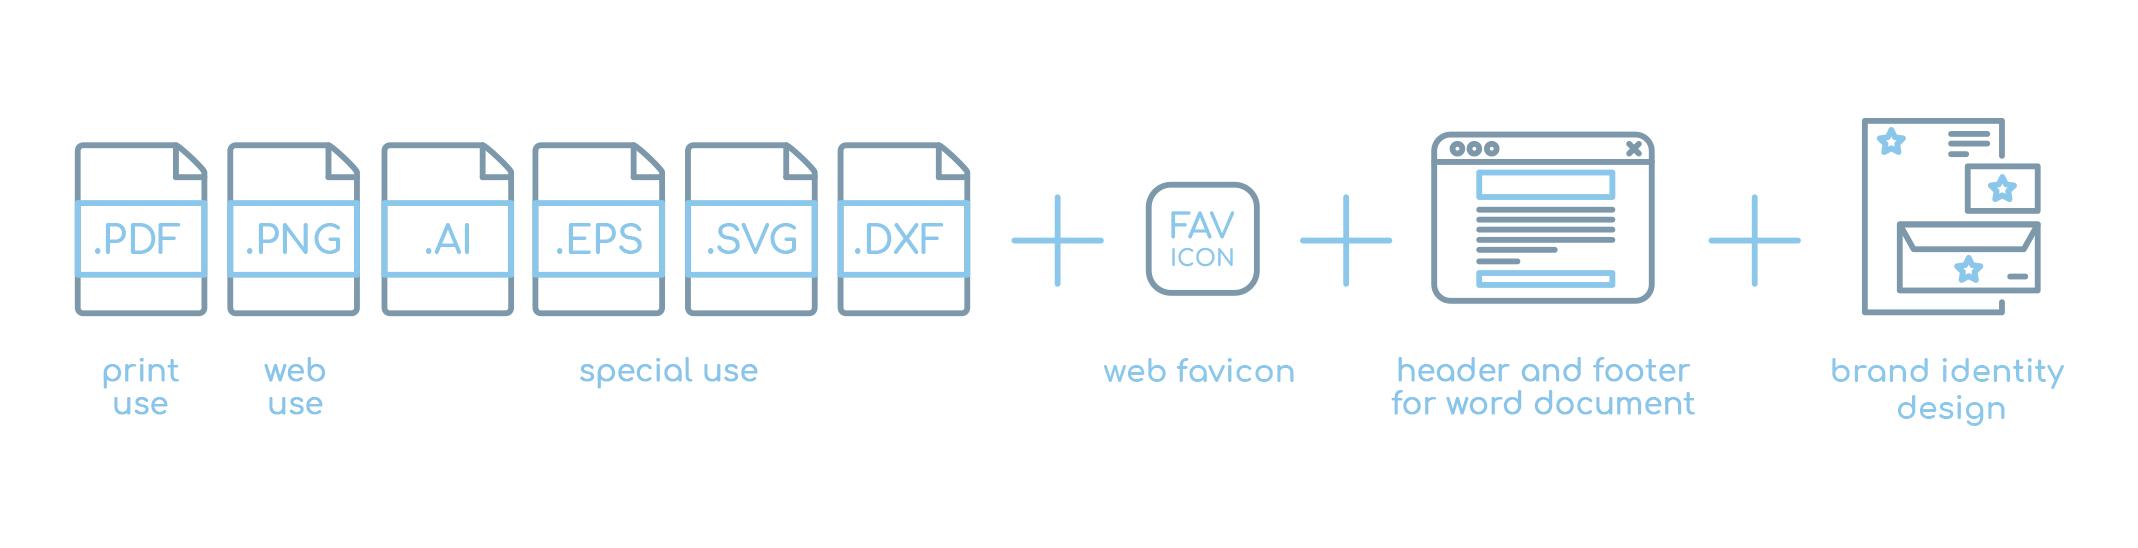 professional logo design file format